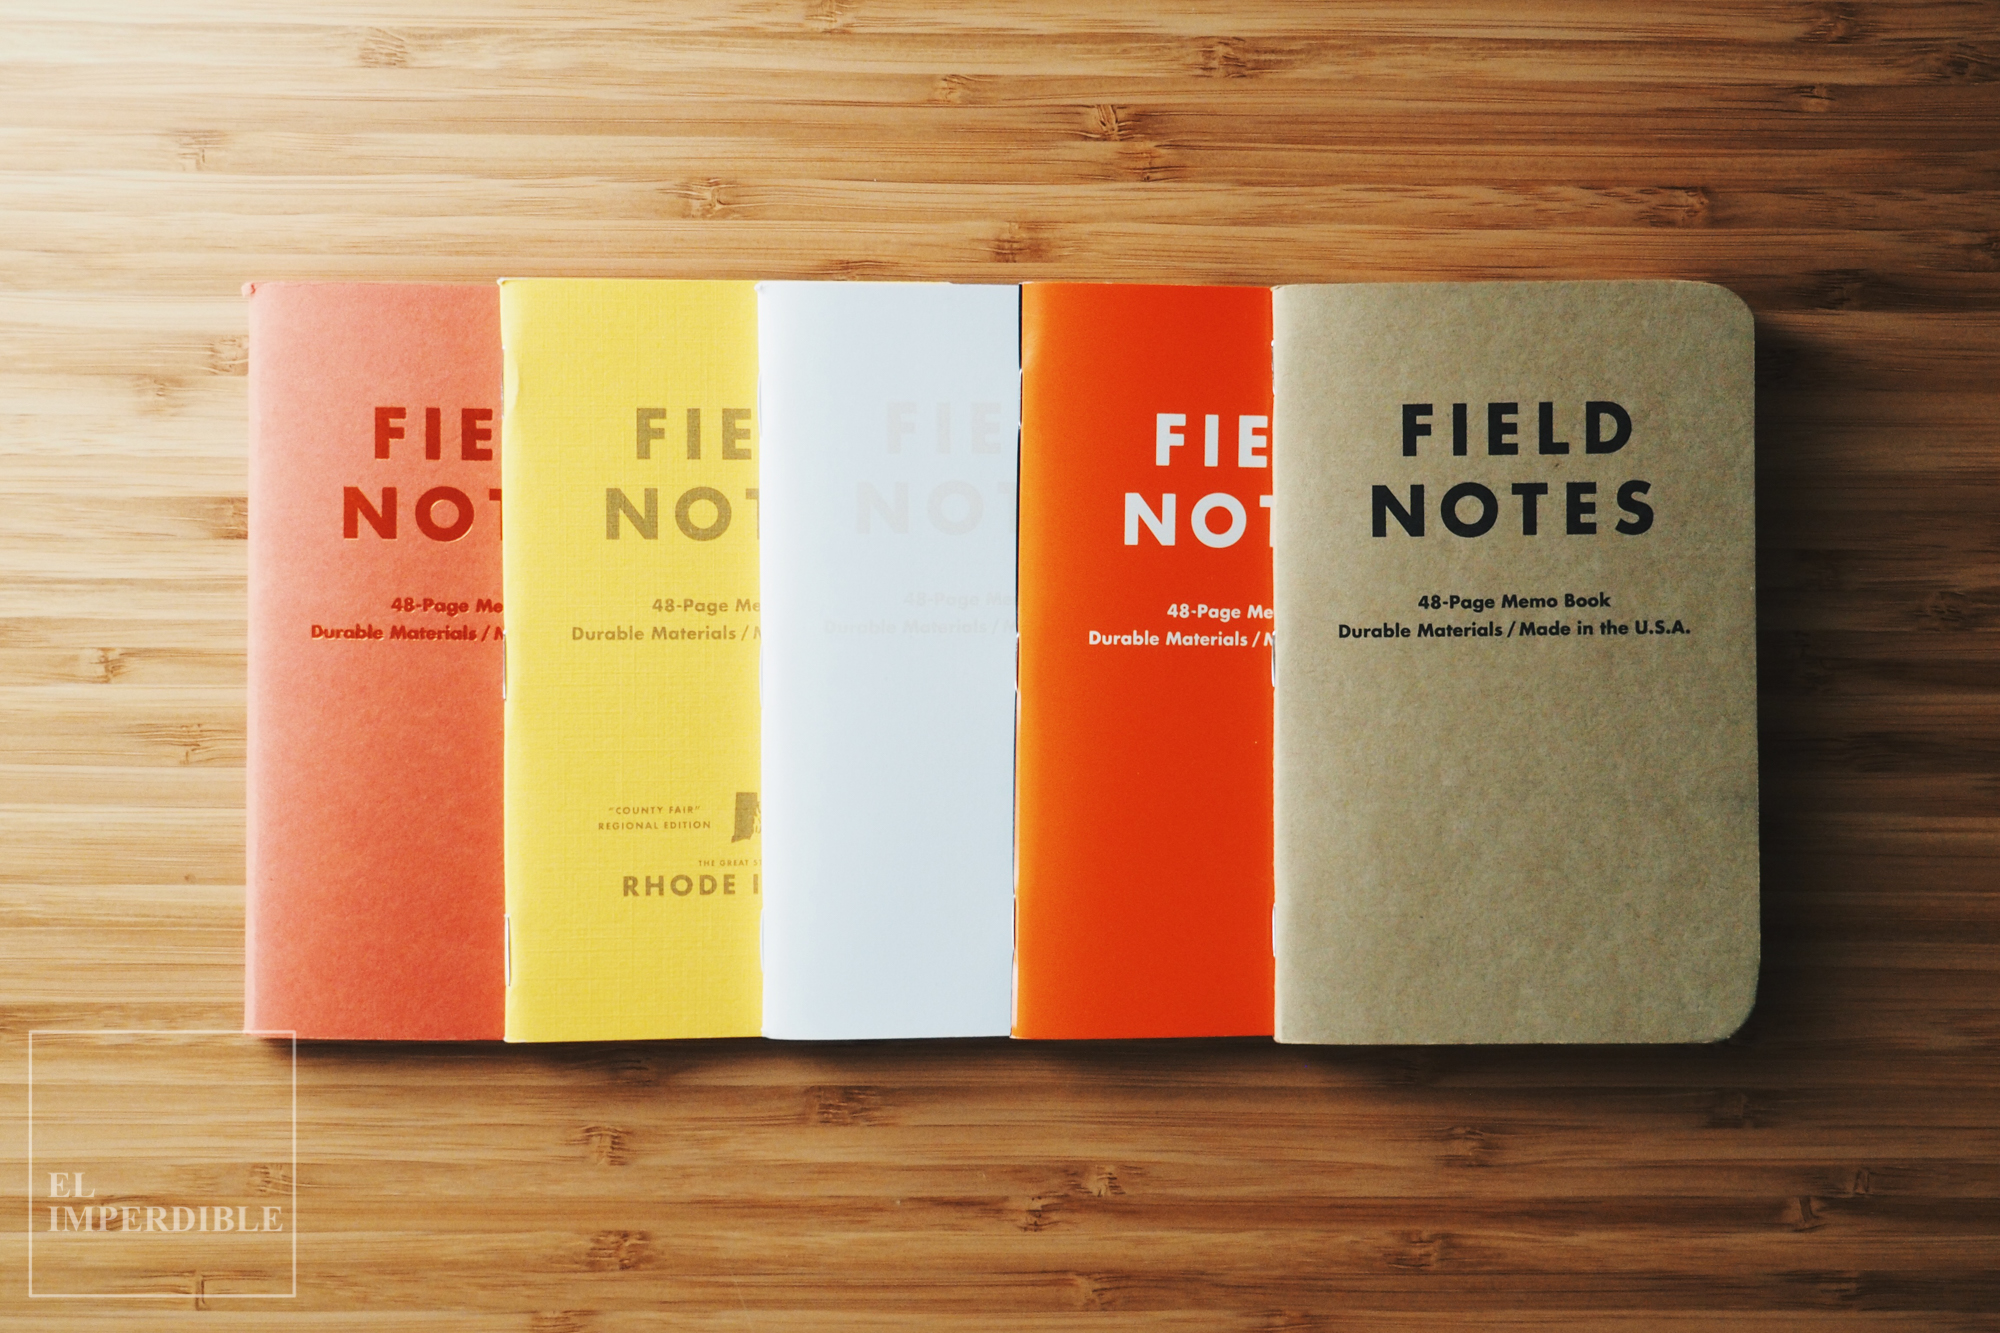 Kit de papelería para escritores Field Notes